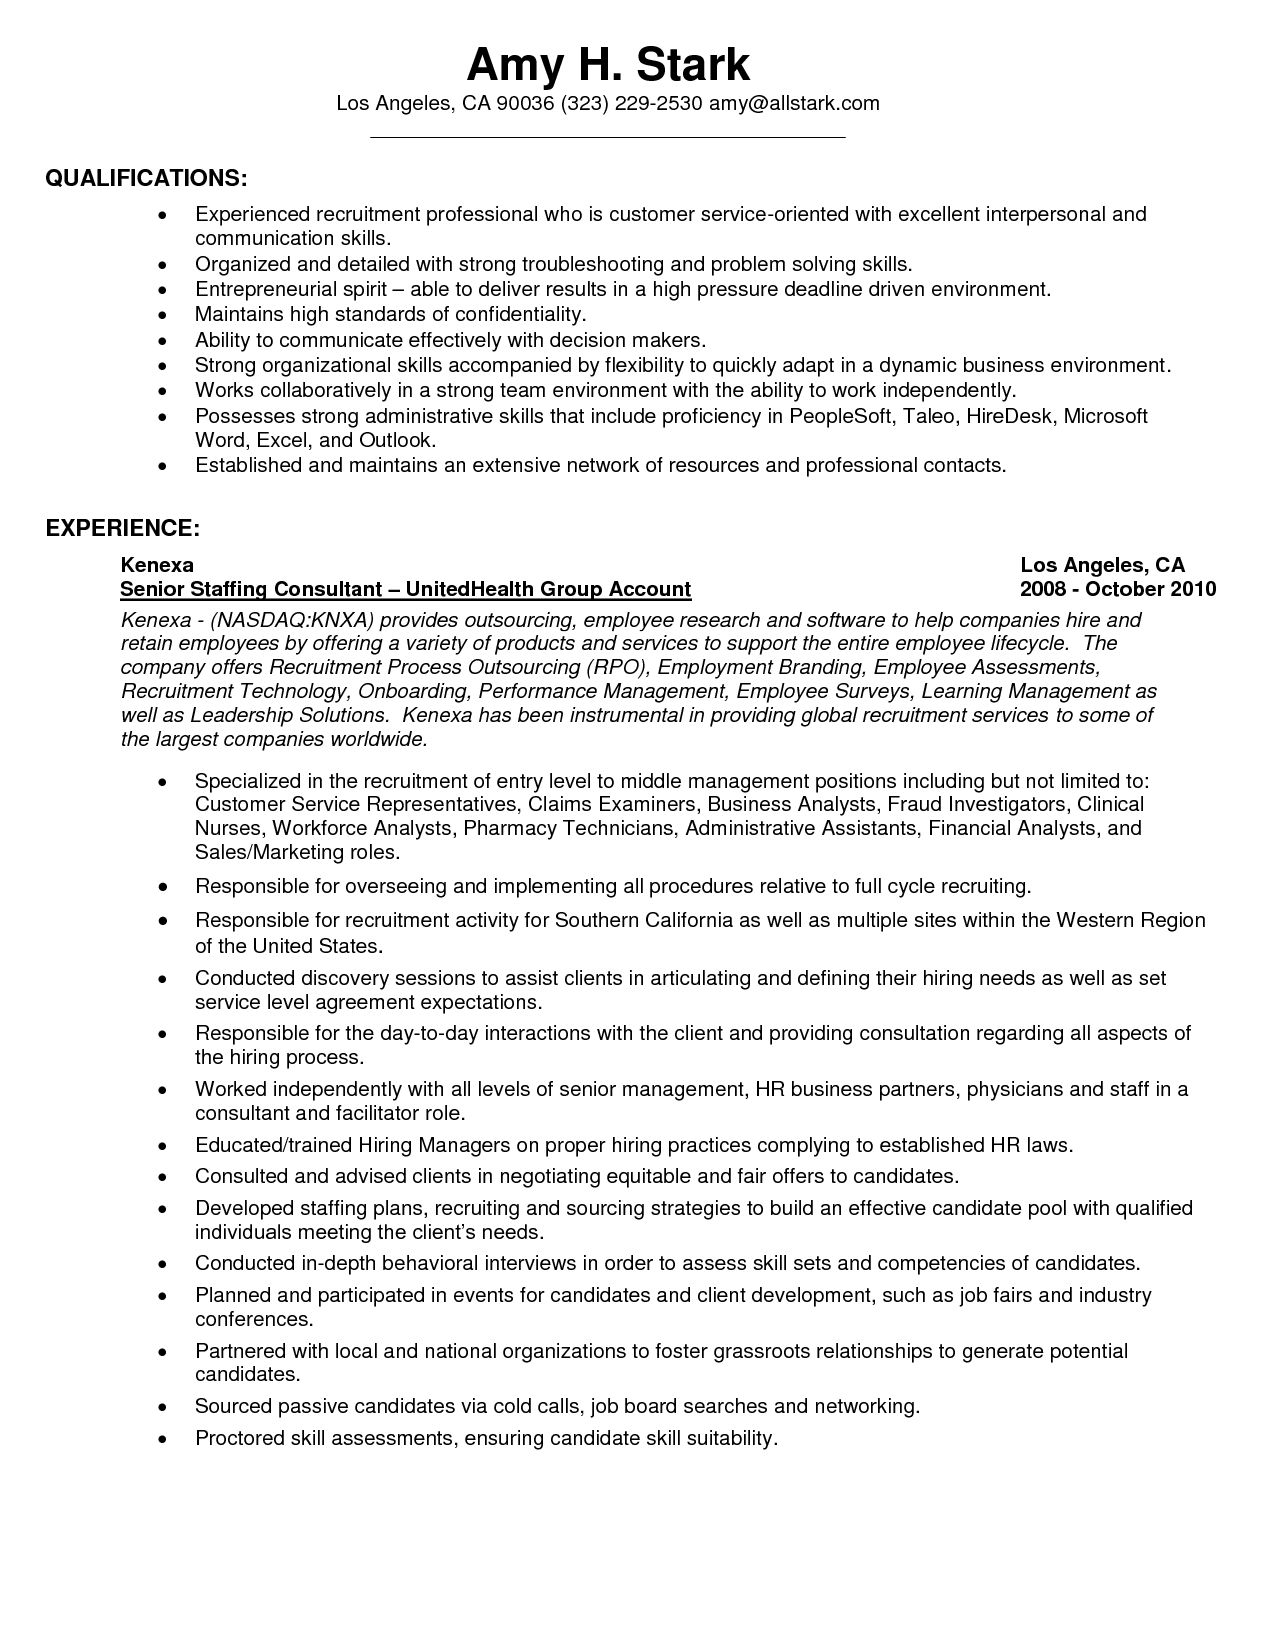 Excellent Customer Service Skills Resume Curriculum